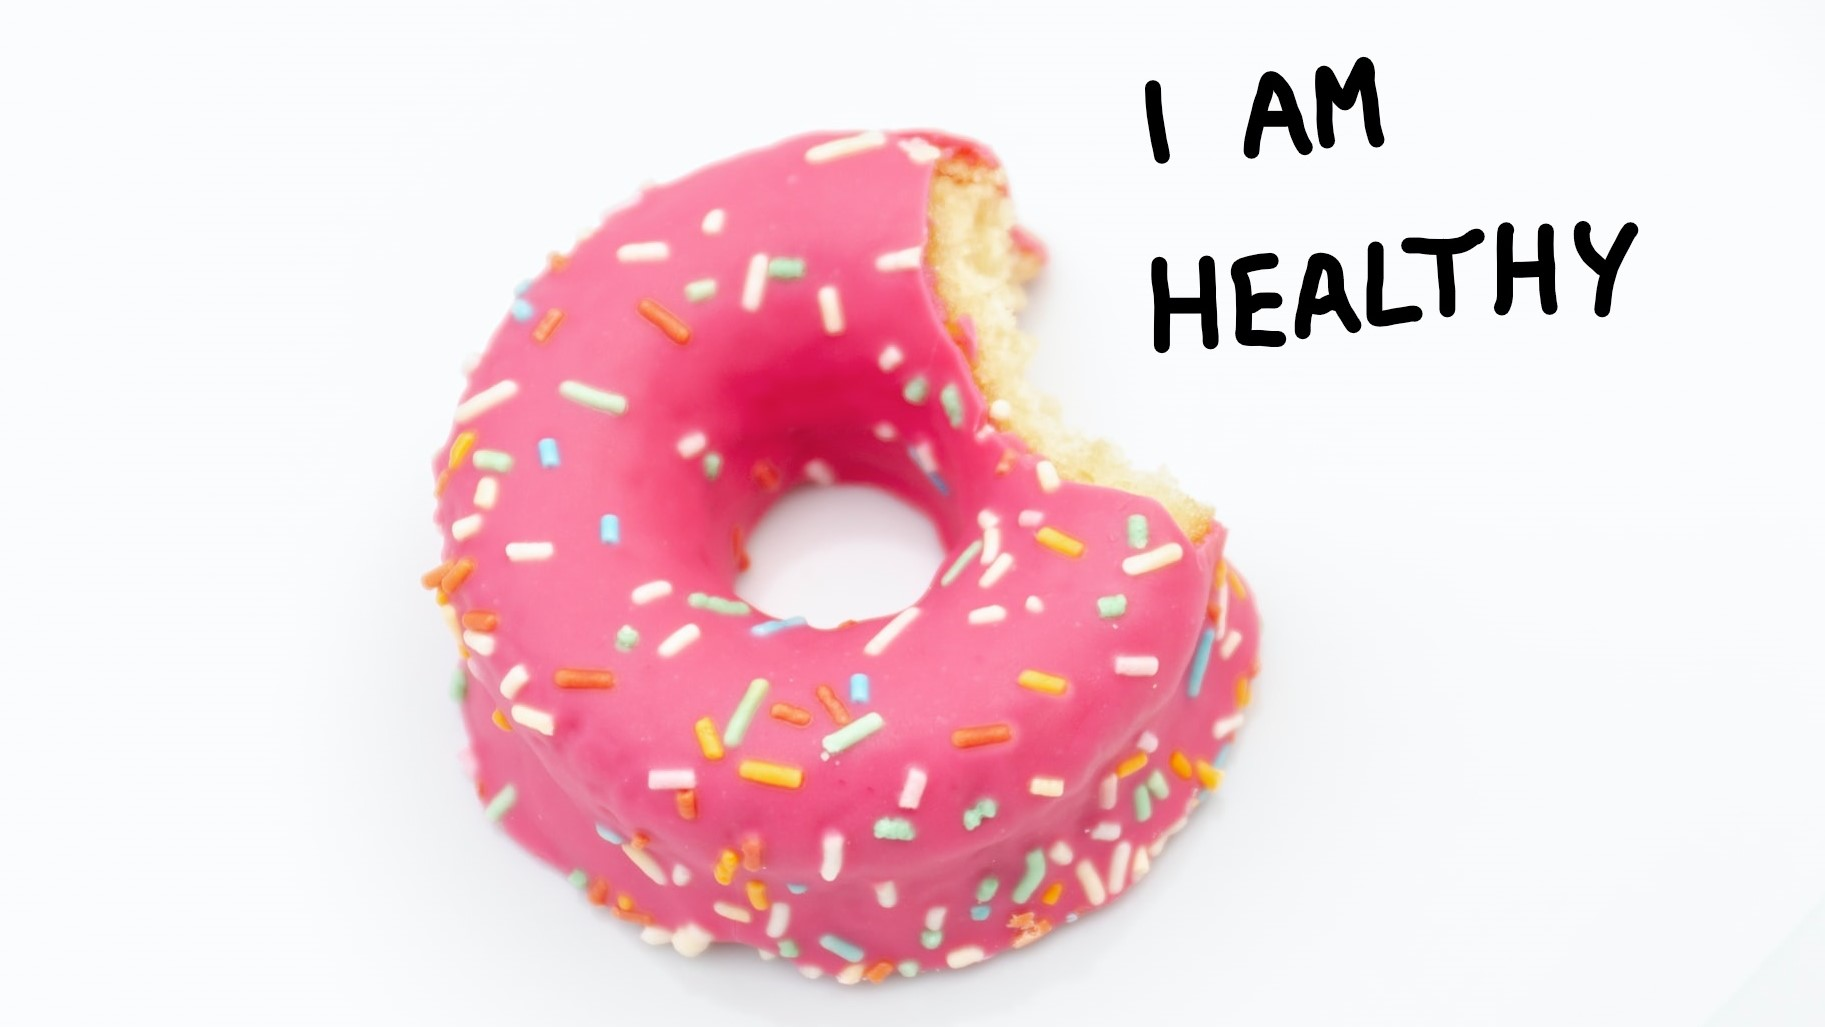 Donut mit Health Claim